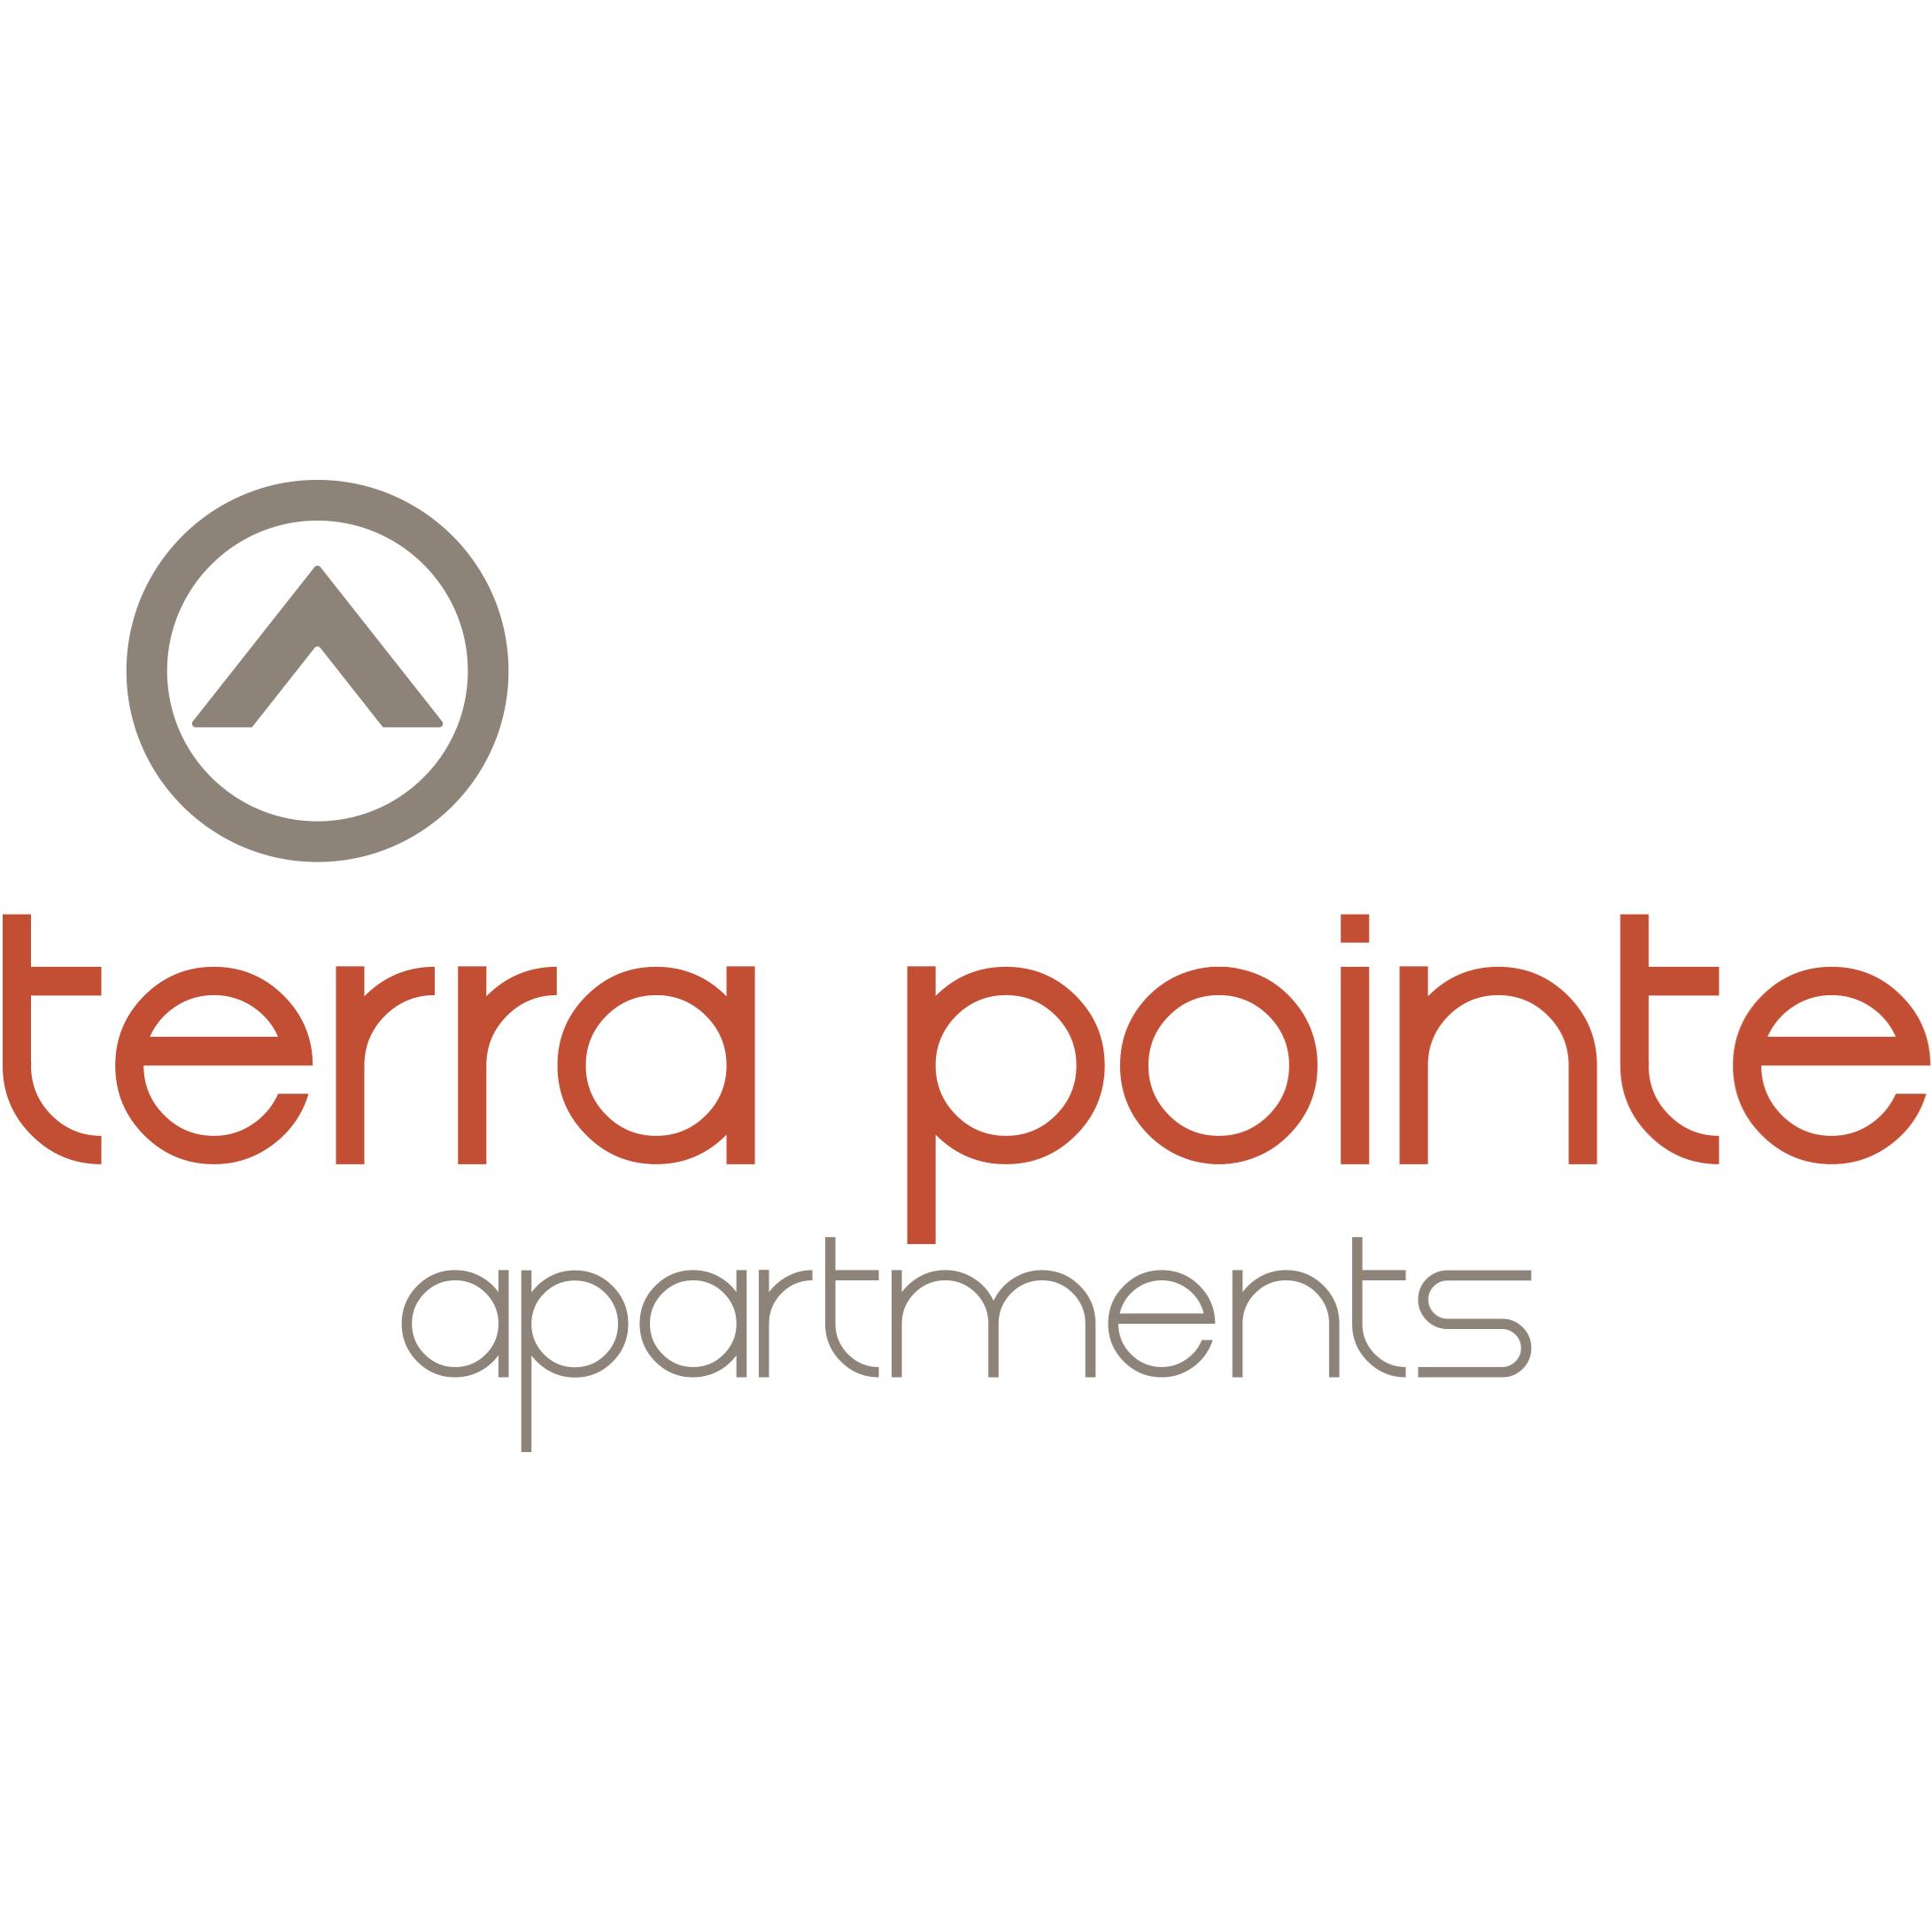 Terra Pointe Apartments